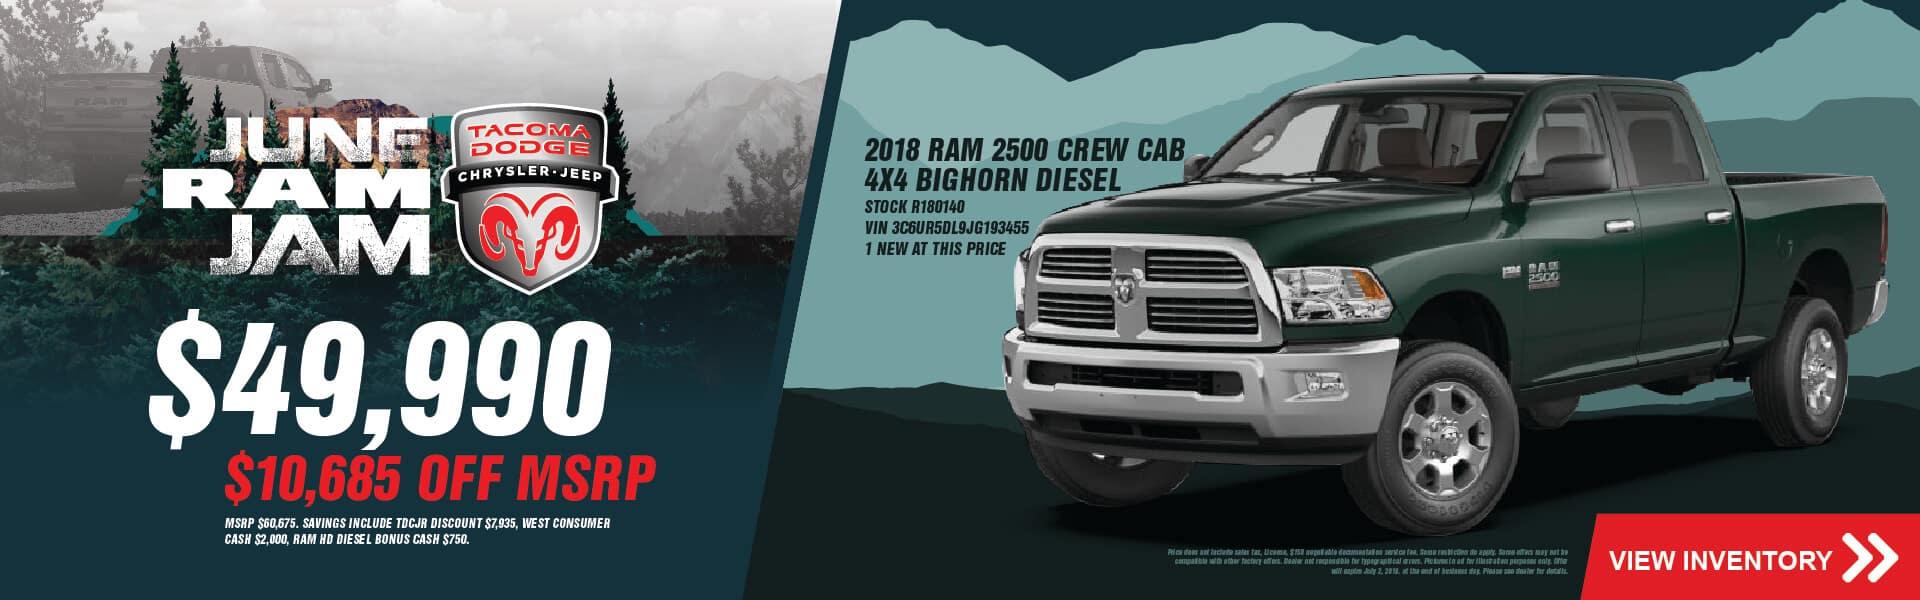 Dodge Dealer in Tacoma, WA | Tacoma Dodge Chrysler Jeep Ram